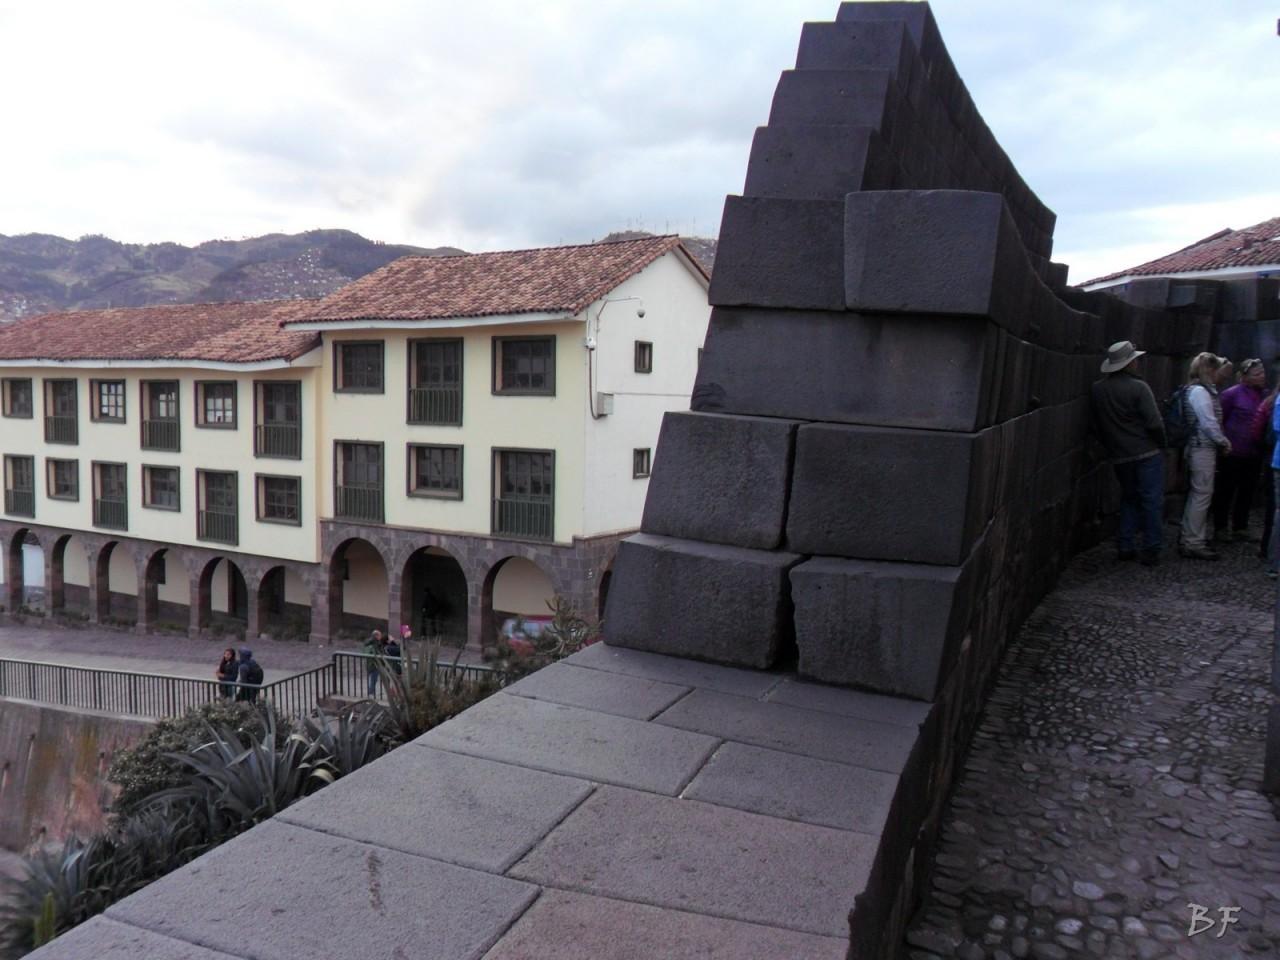 Mura-Poligonali-Megaliti-Tempio-Coricancha-Cusco-Perù-51